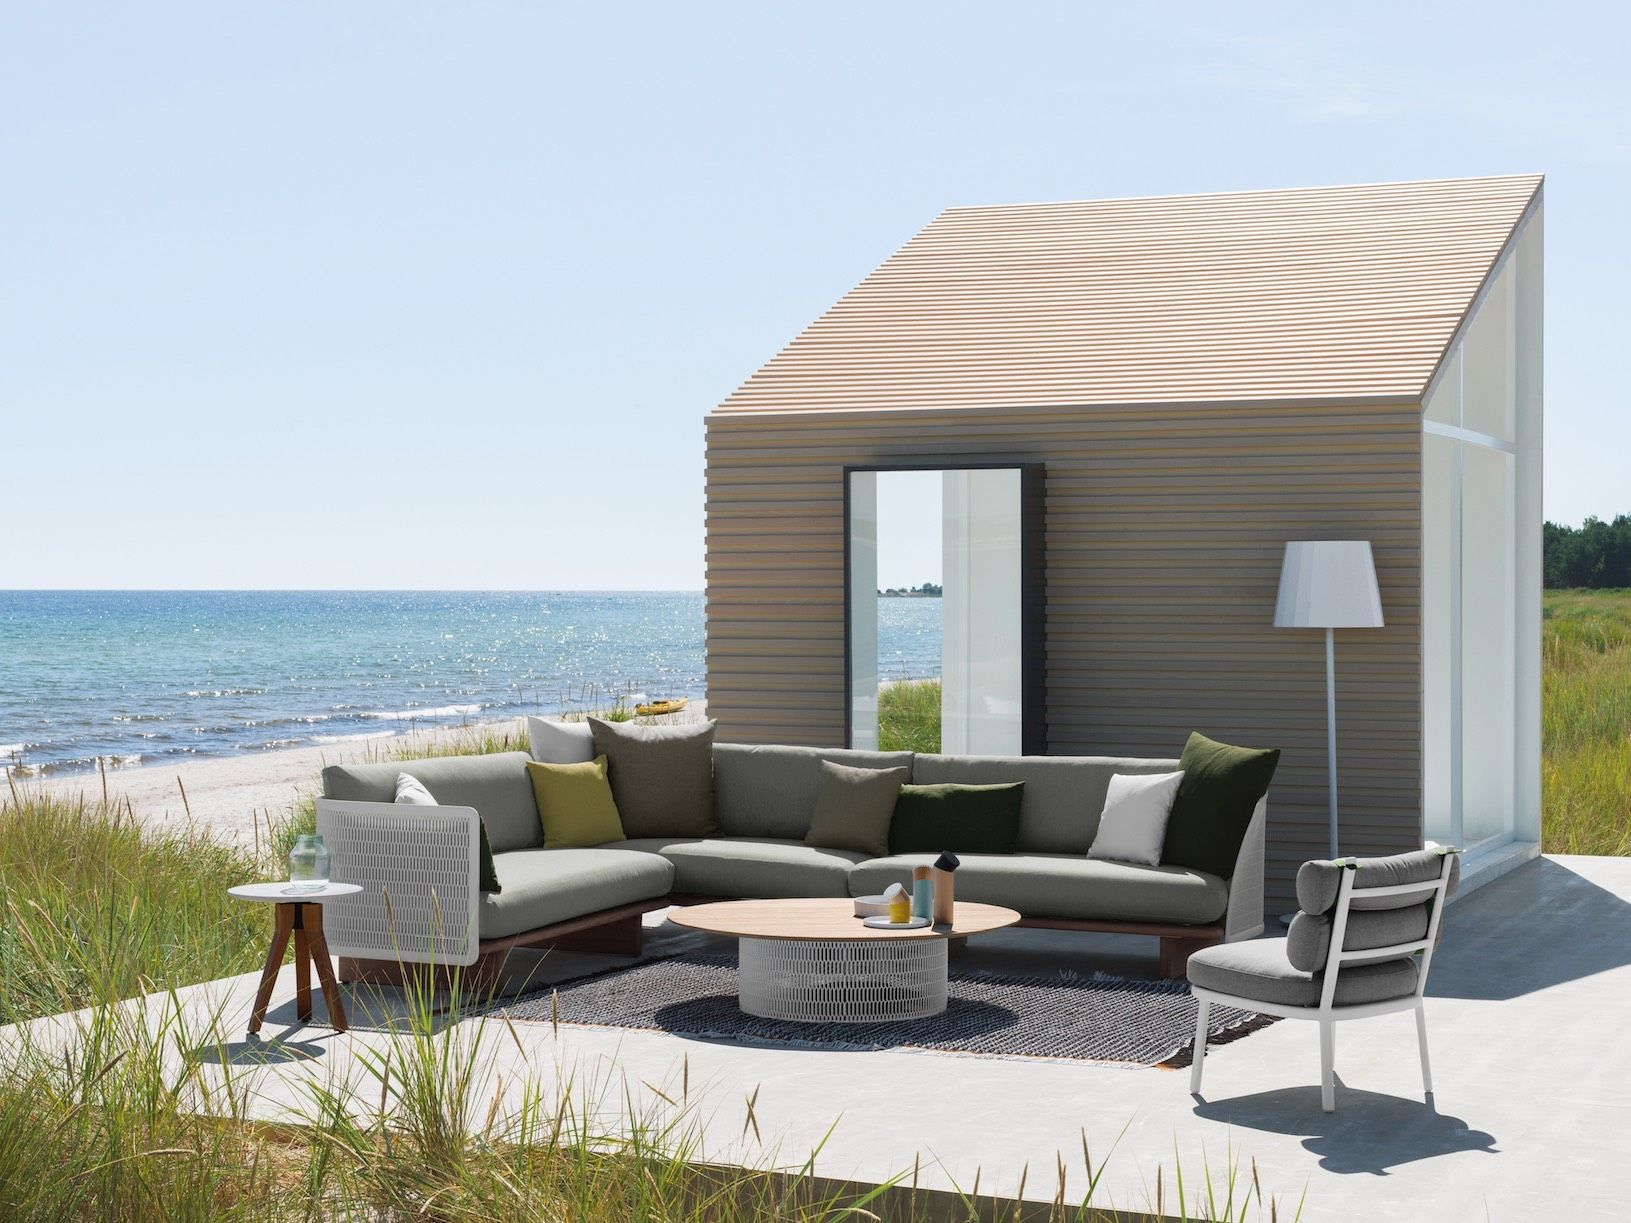 Sofá de esquina de jardín exterior de diseño